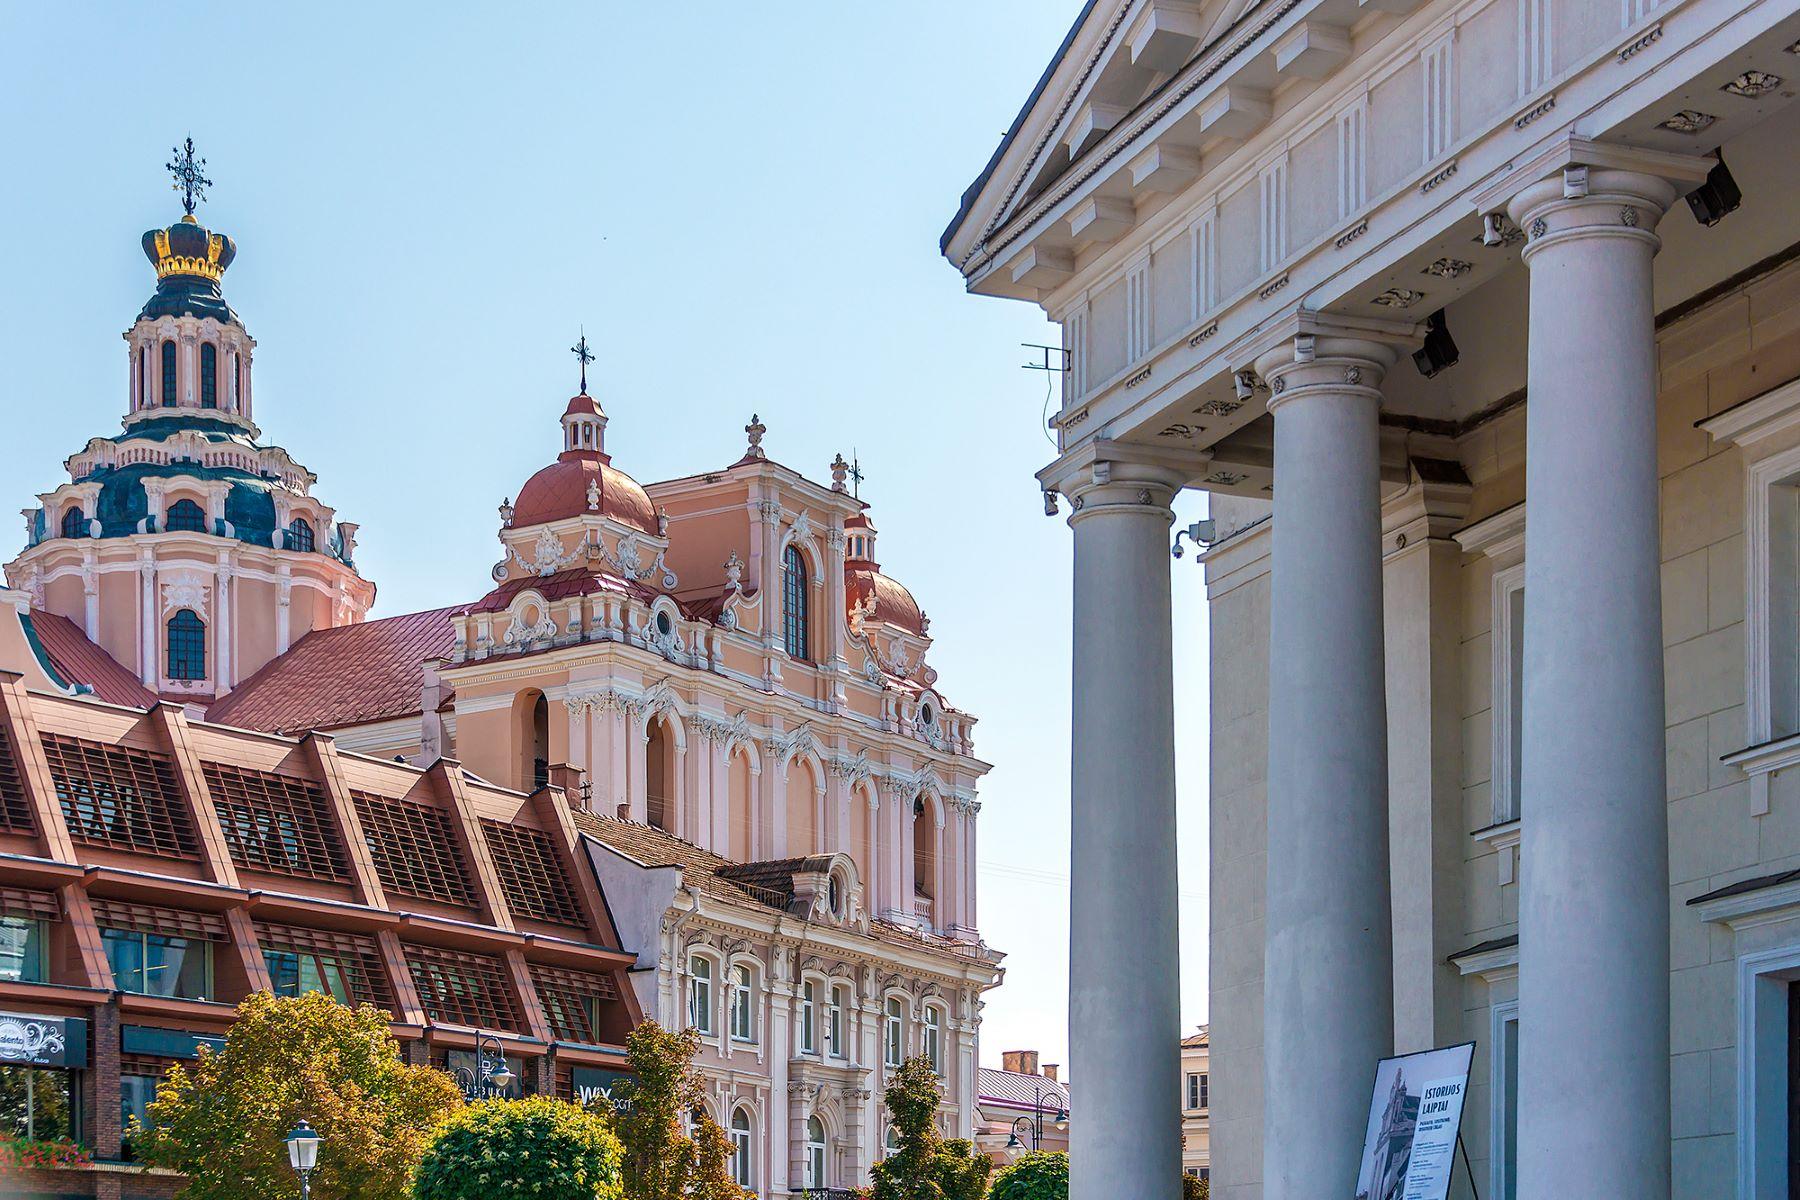 townhouses por un Venta en Exclusive Building in the Heart of Old Town Vilnius, Vilnius County Lituania